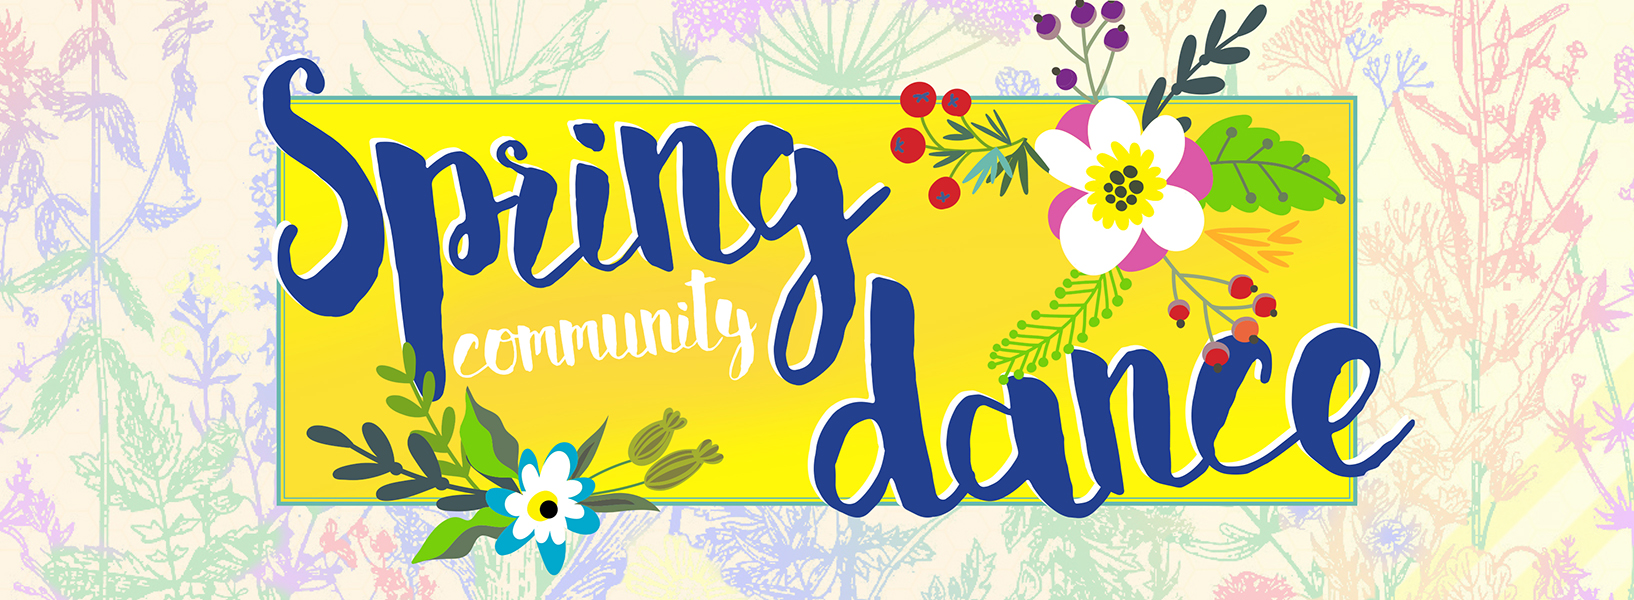 Spring Community Dance 4/13/18.